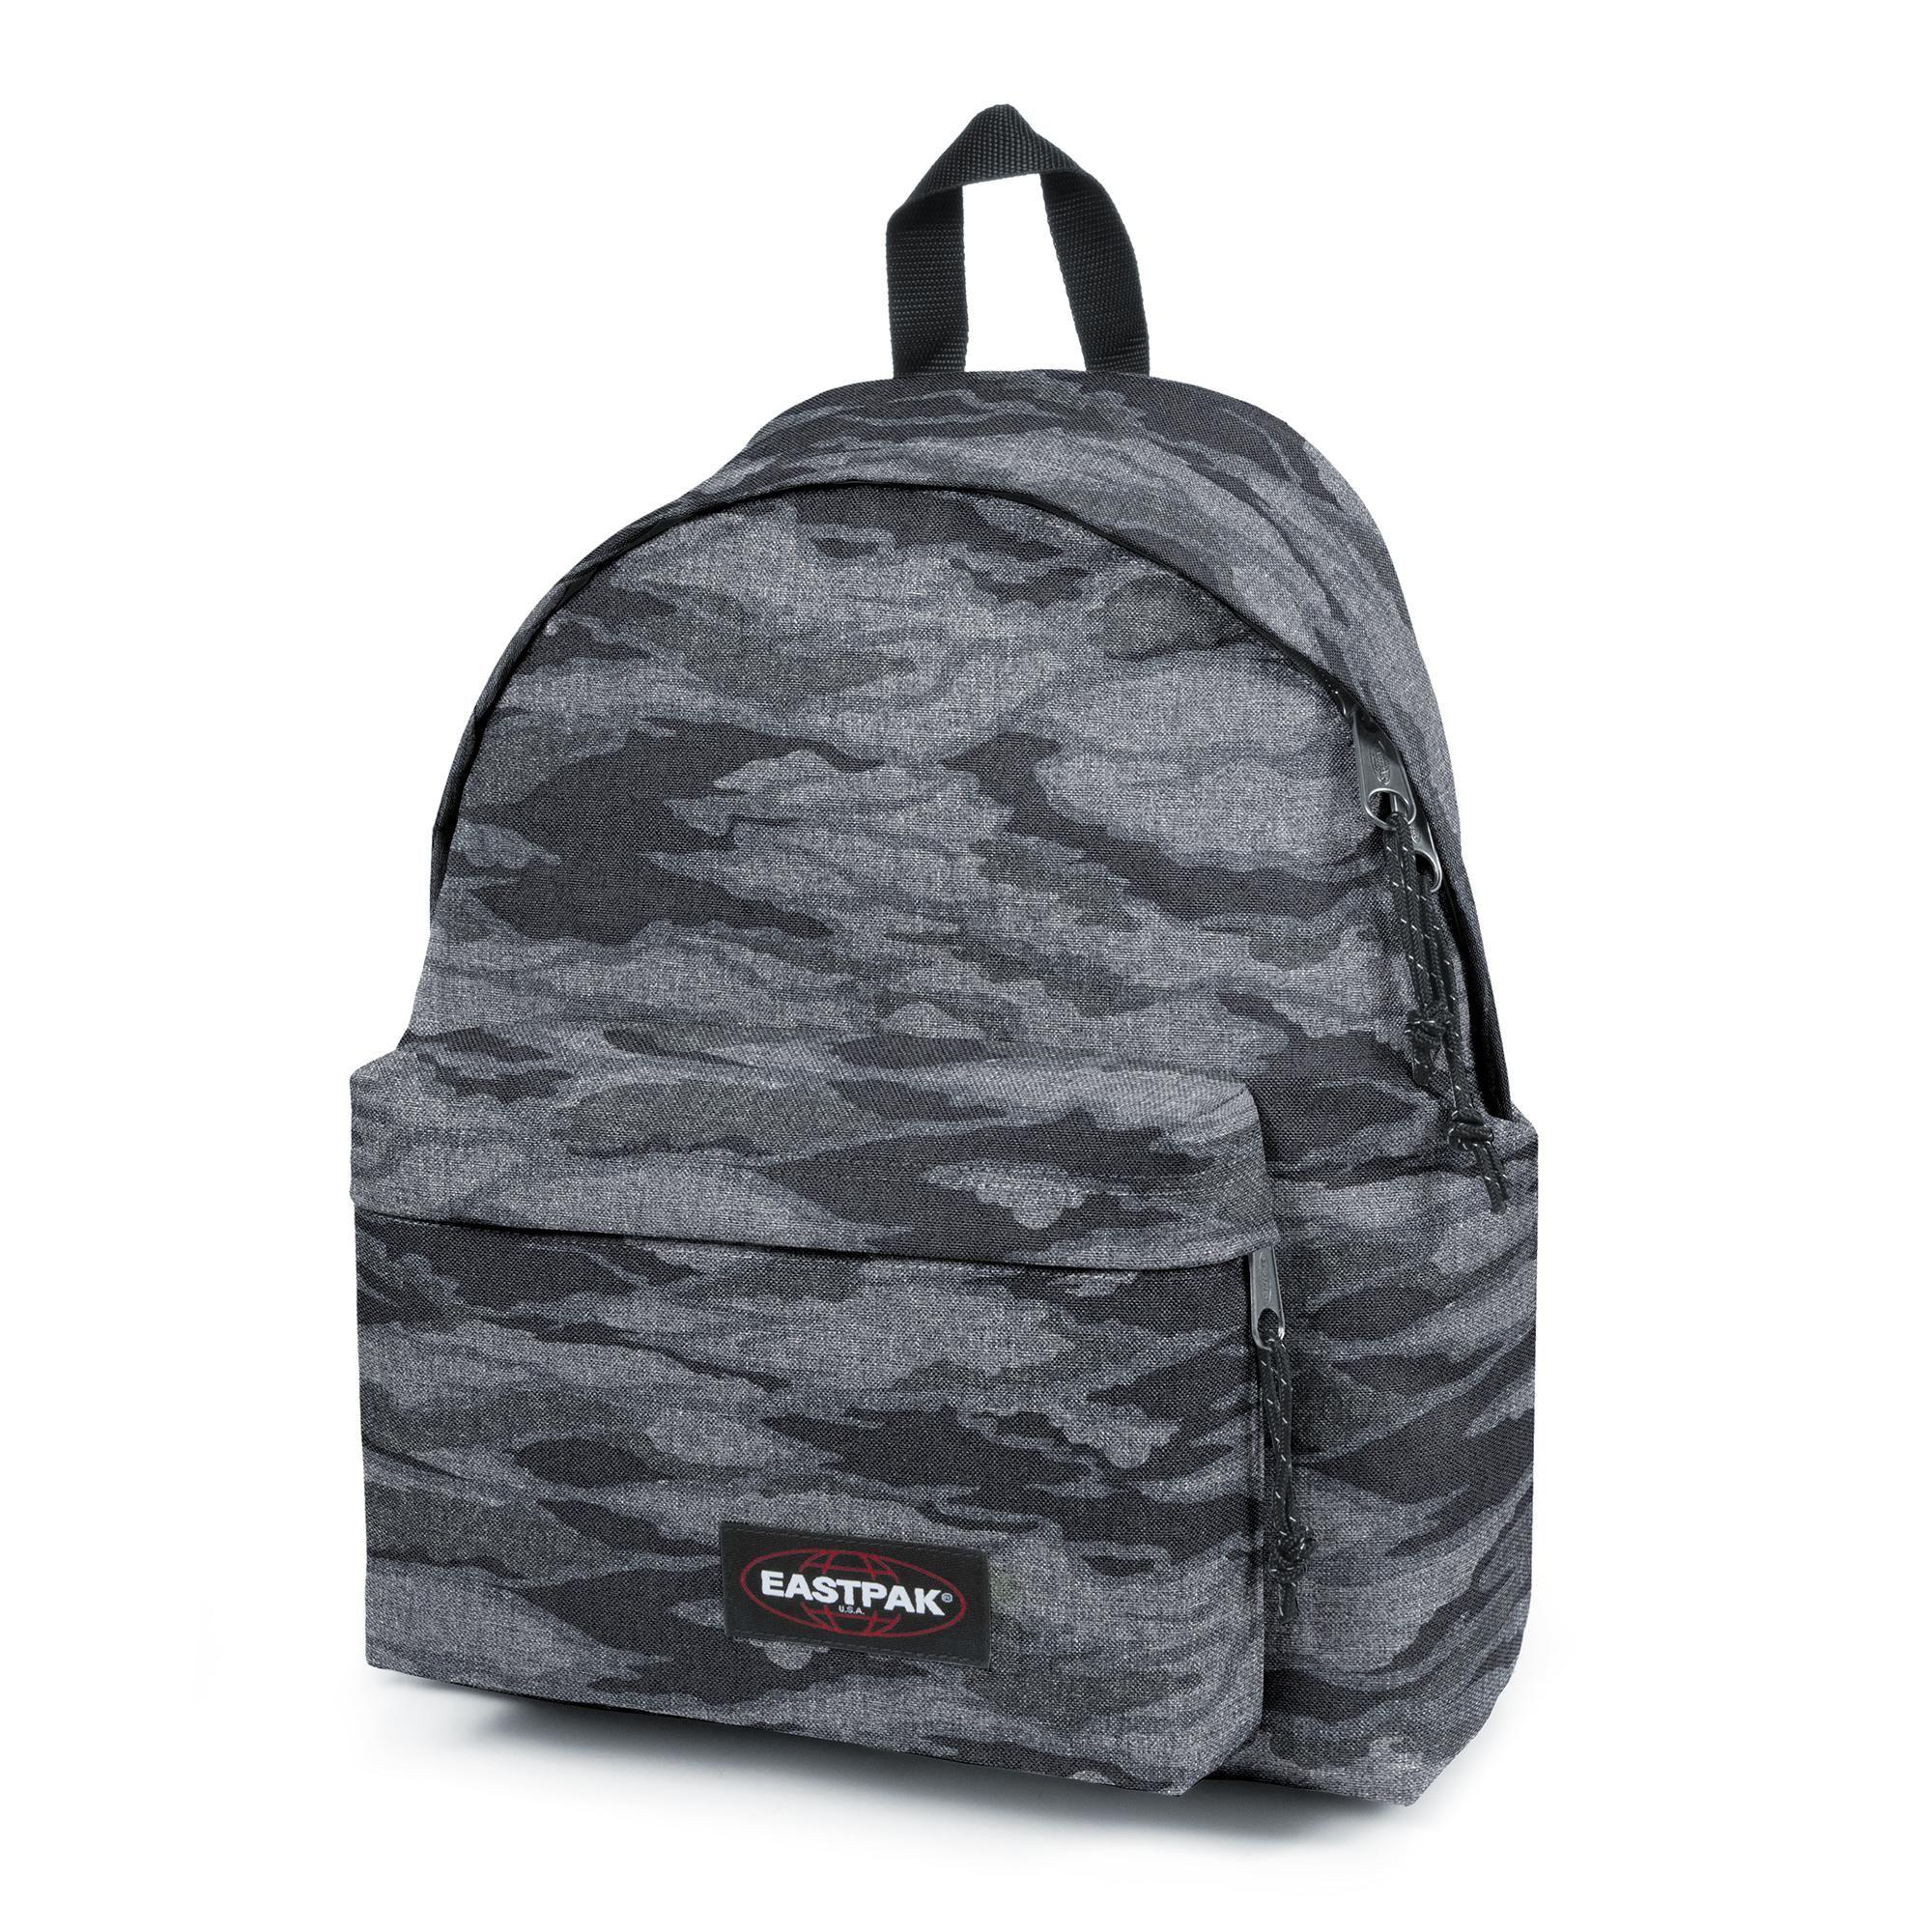 18a132b667e Pin van Samdam Retail op Eastpak - Boys backpacks, Backpacks en Fashion  backpack